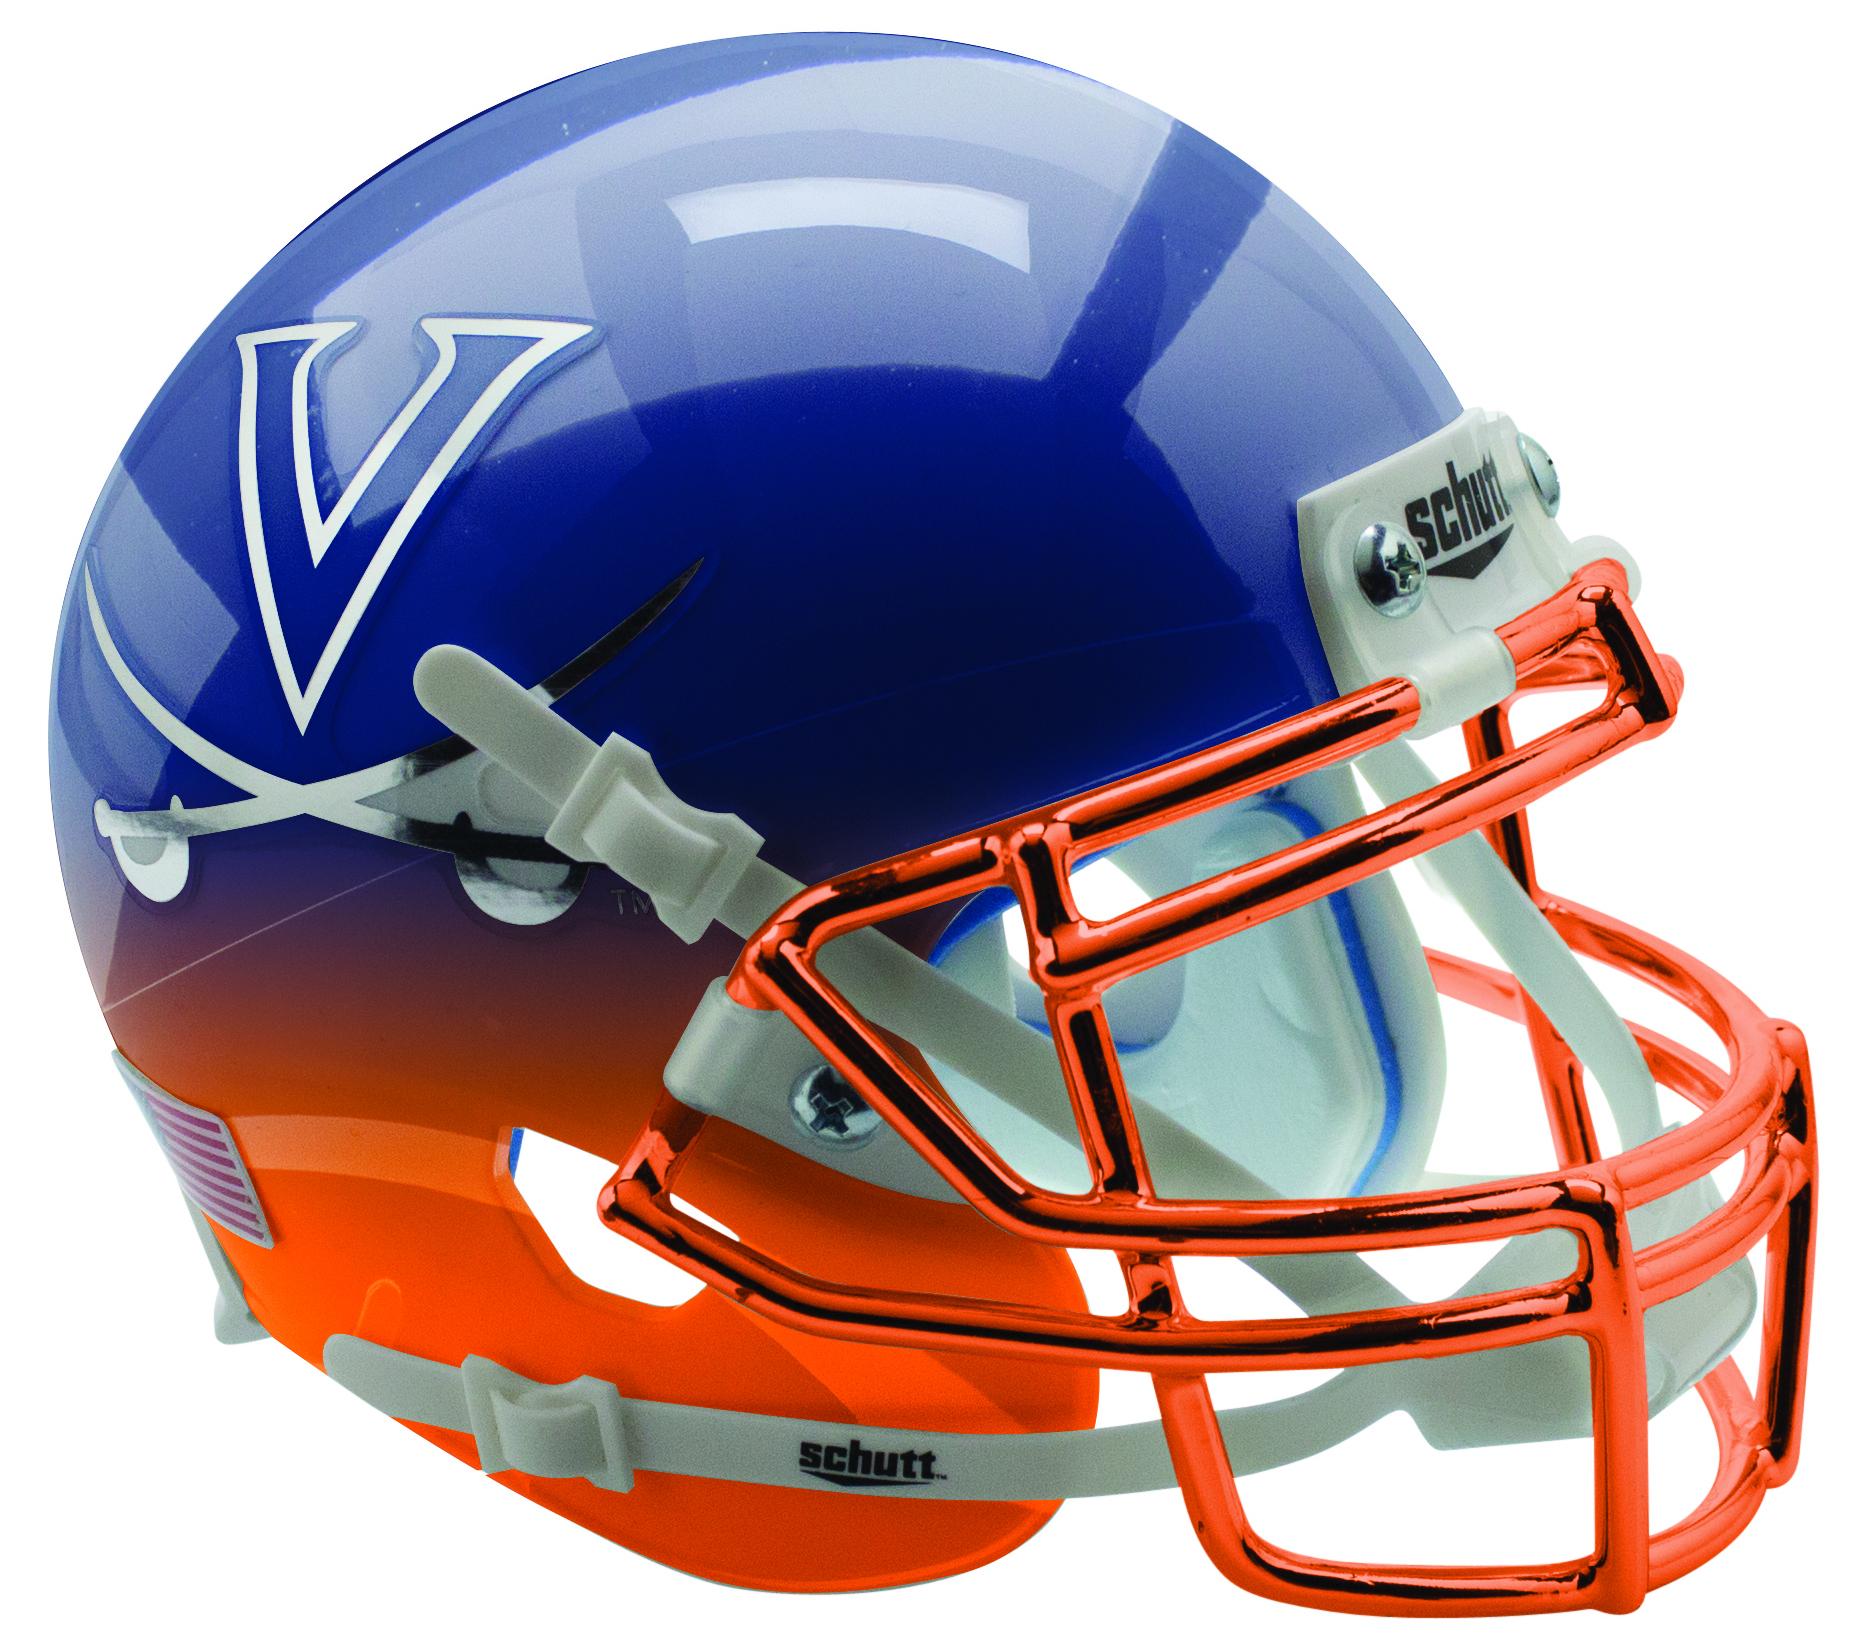 Virginia Cavaliers Full XP Replica Football Helmet Schutt <B>Navy Orange Featherhead with Chrome Mask</B>